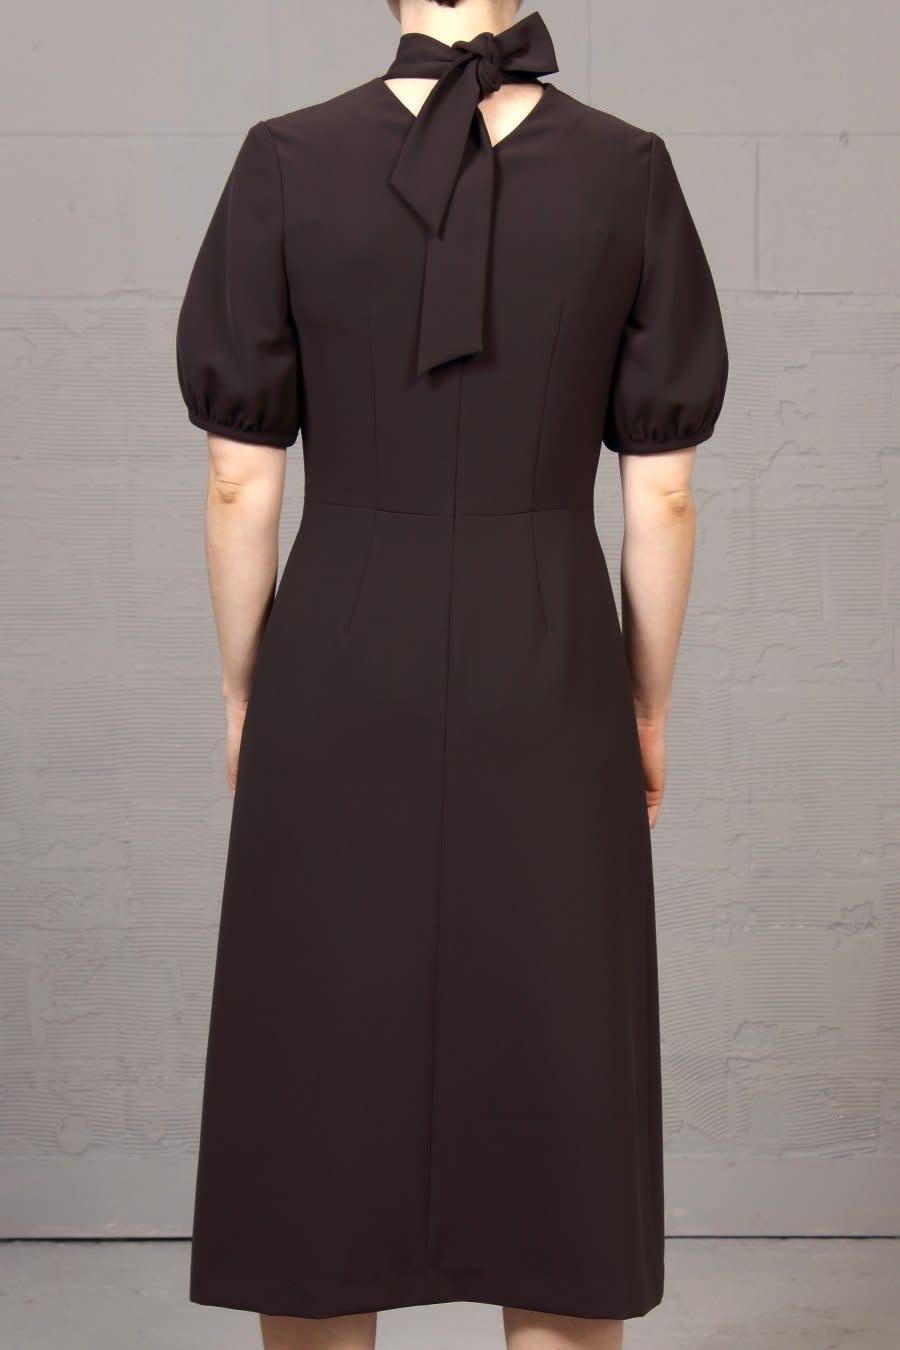 Comrags Toyah Dress